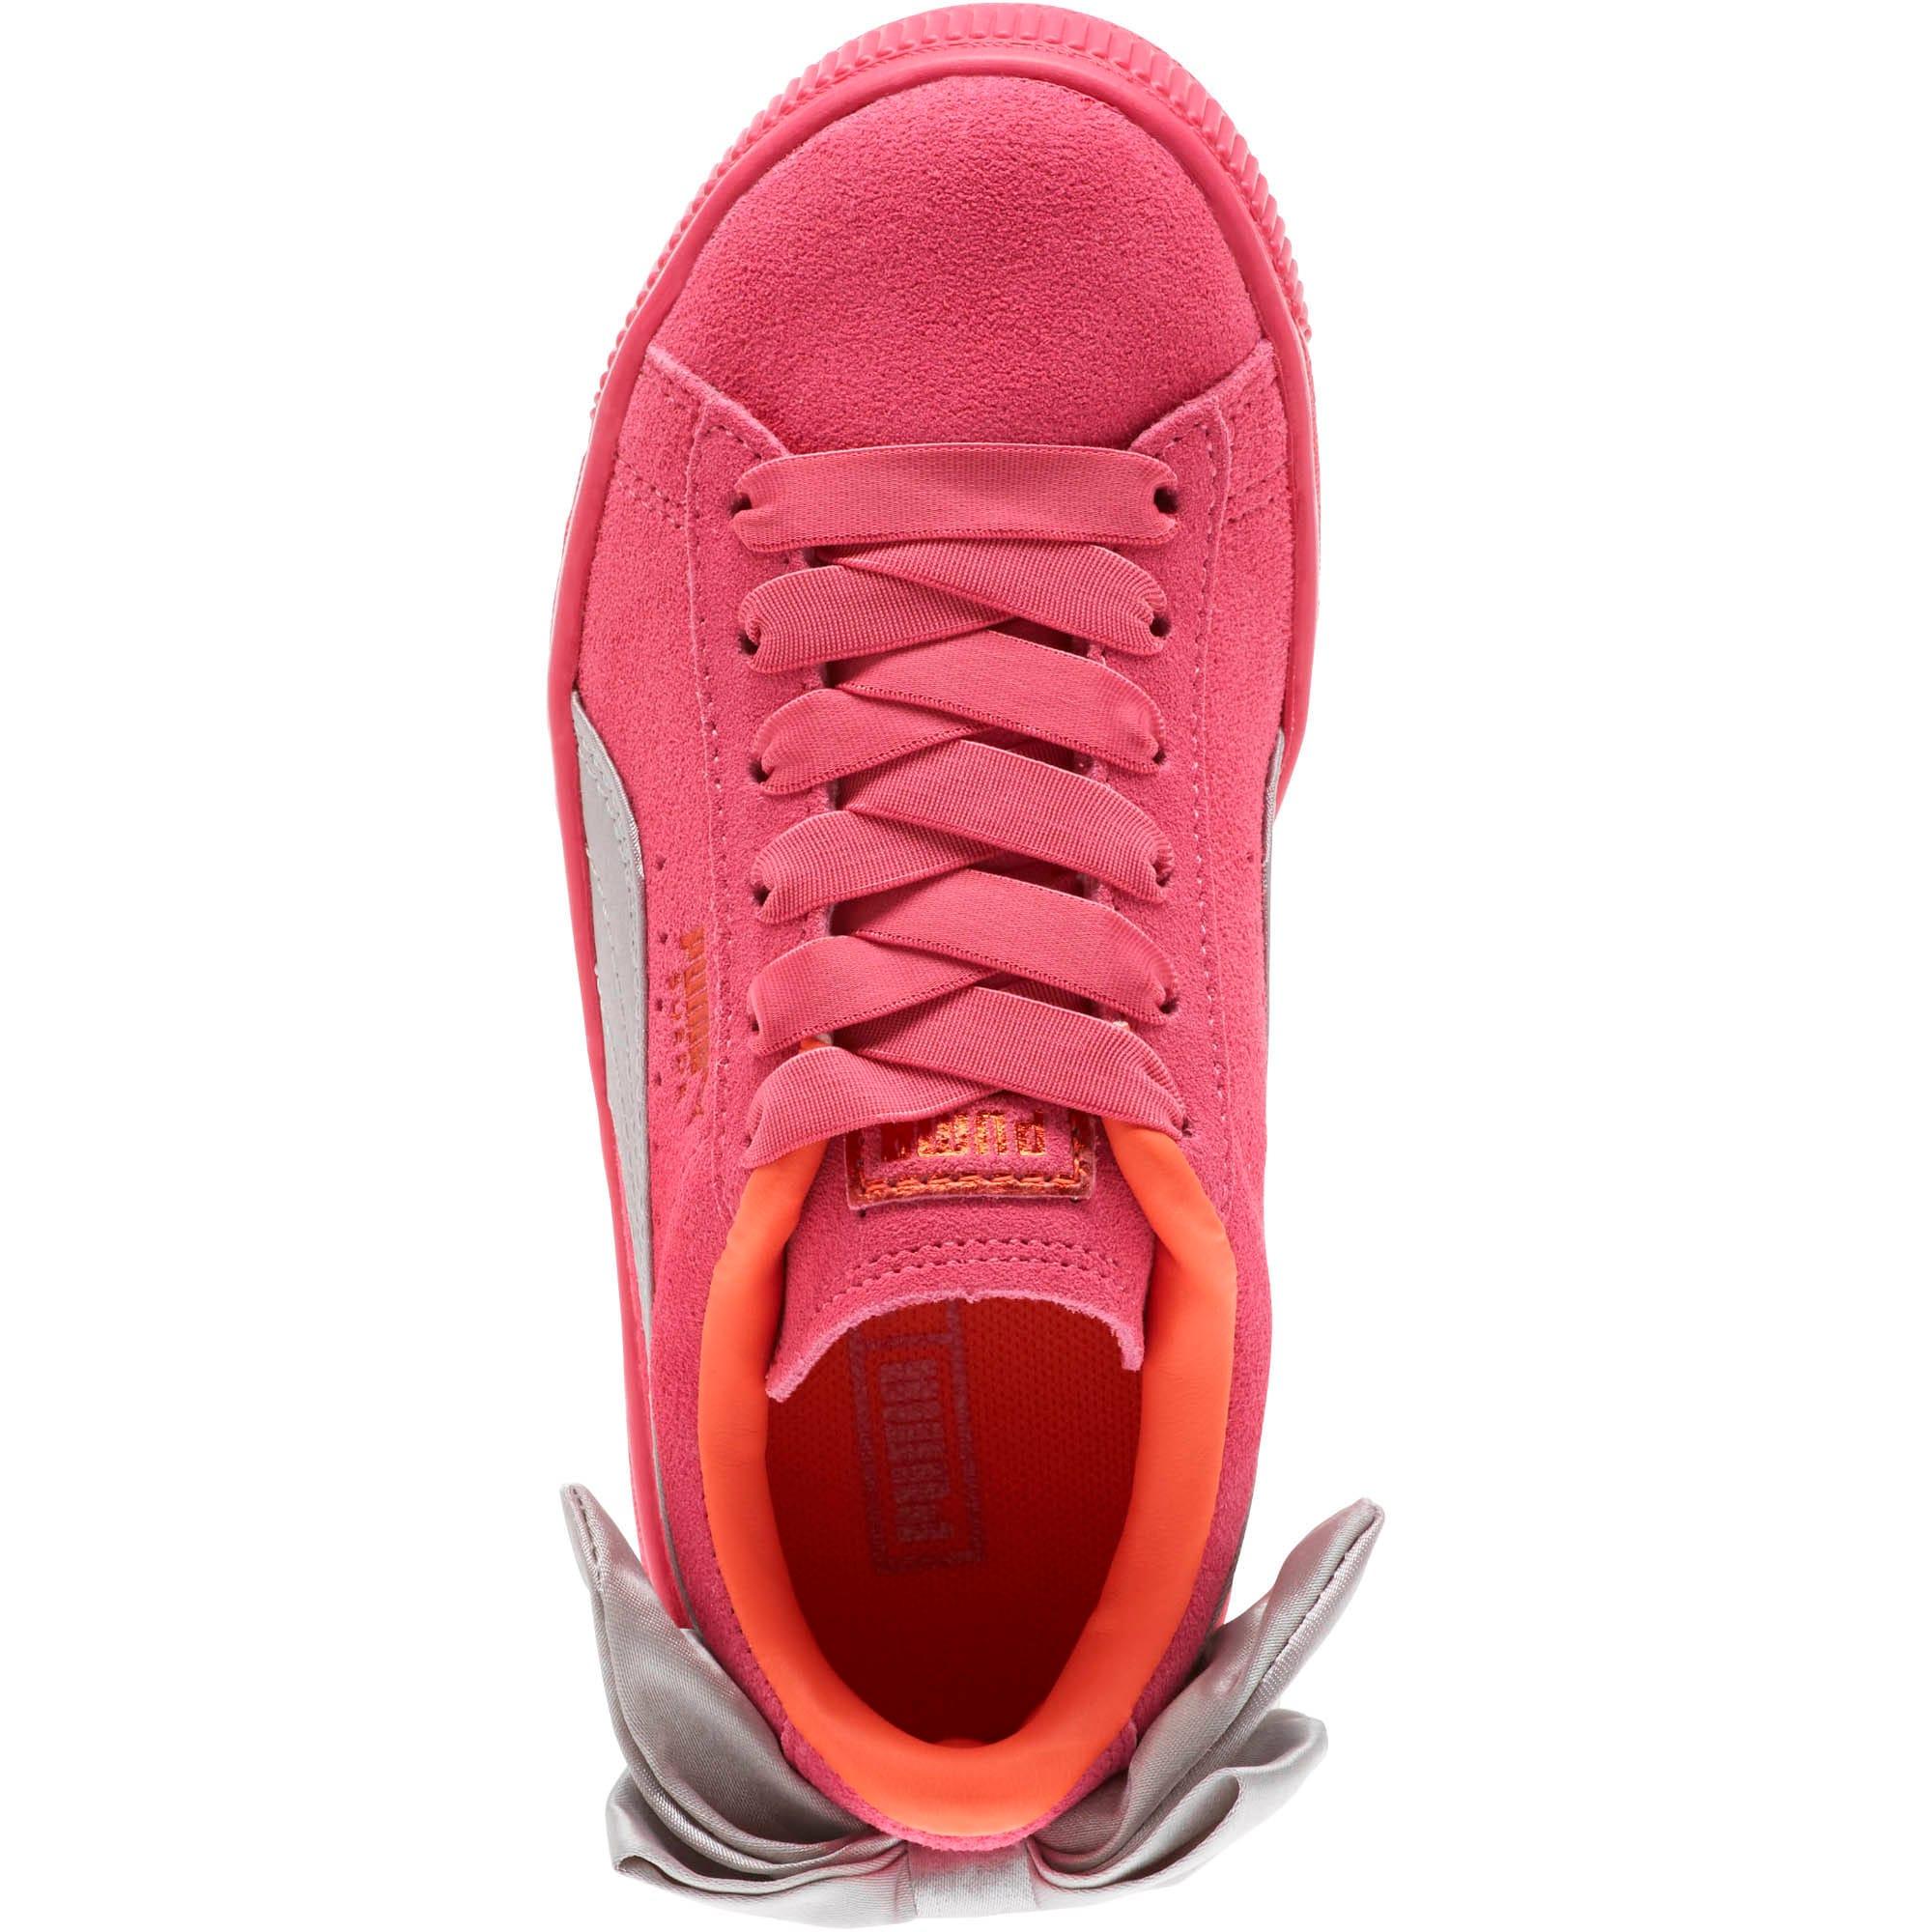 Miniatura 5 de Zapatos Suede Bow AC para niños pequeños, Fuchsia Purple-Nasturtium, mediano